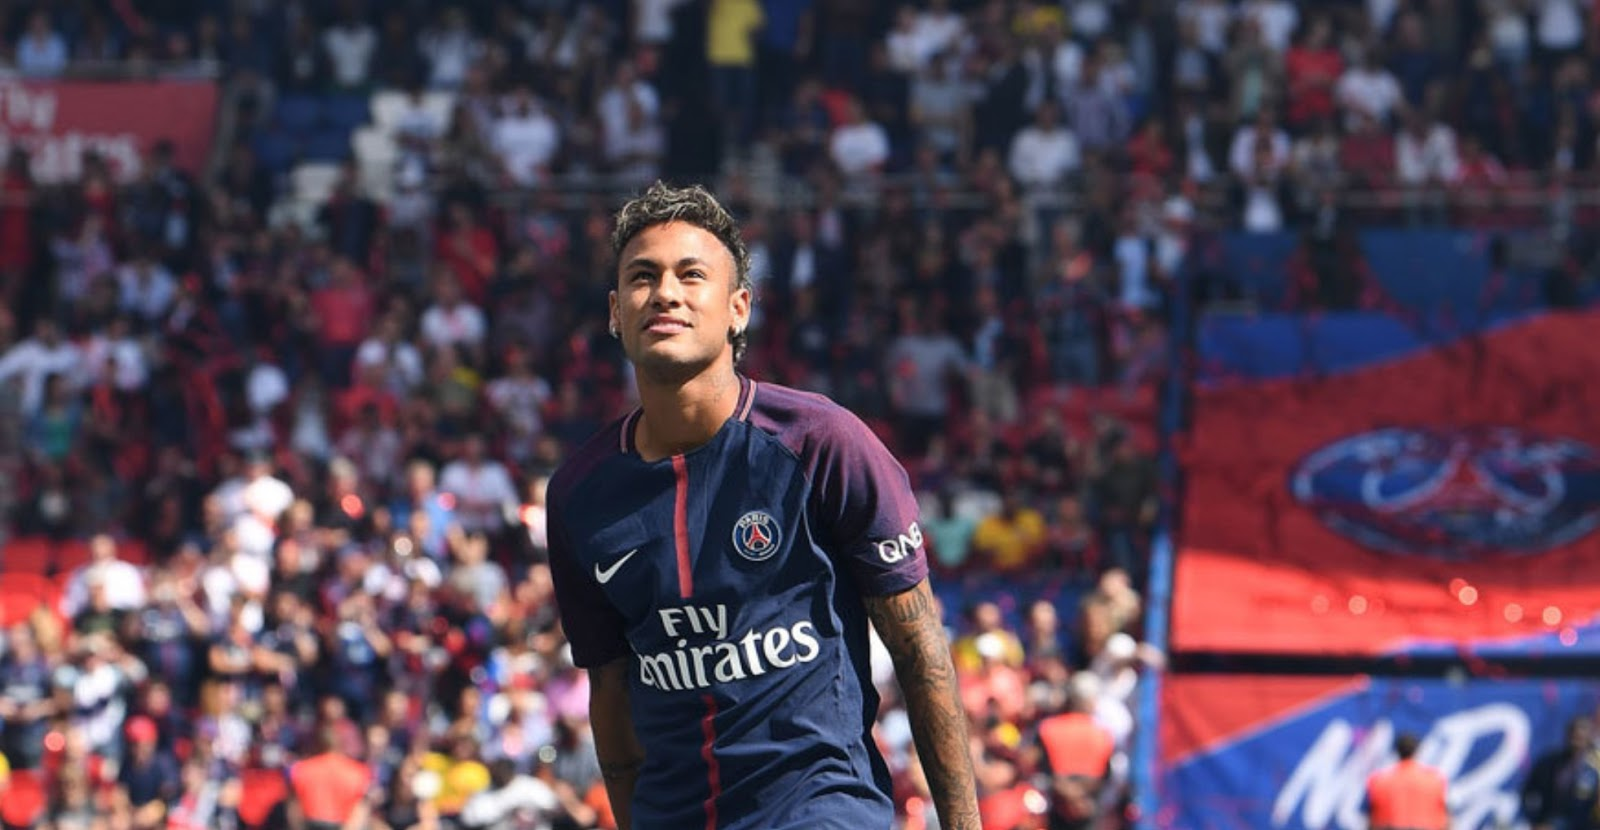 Neymar Per match salary at PSG is $1 million